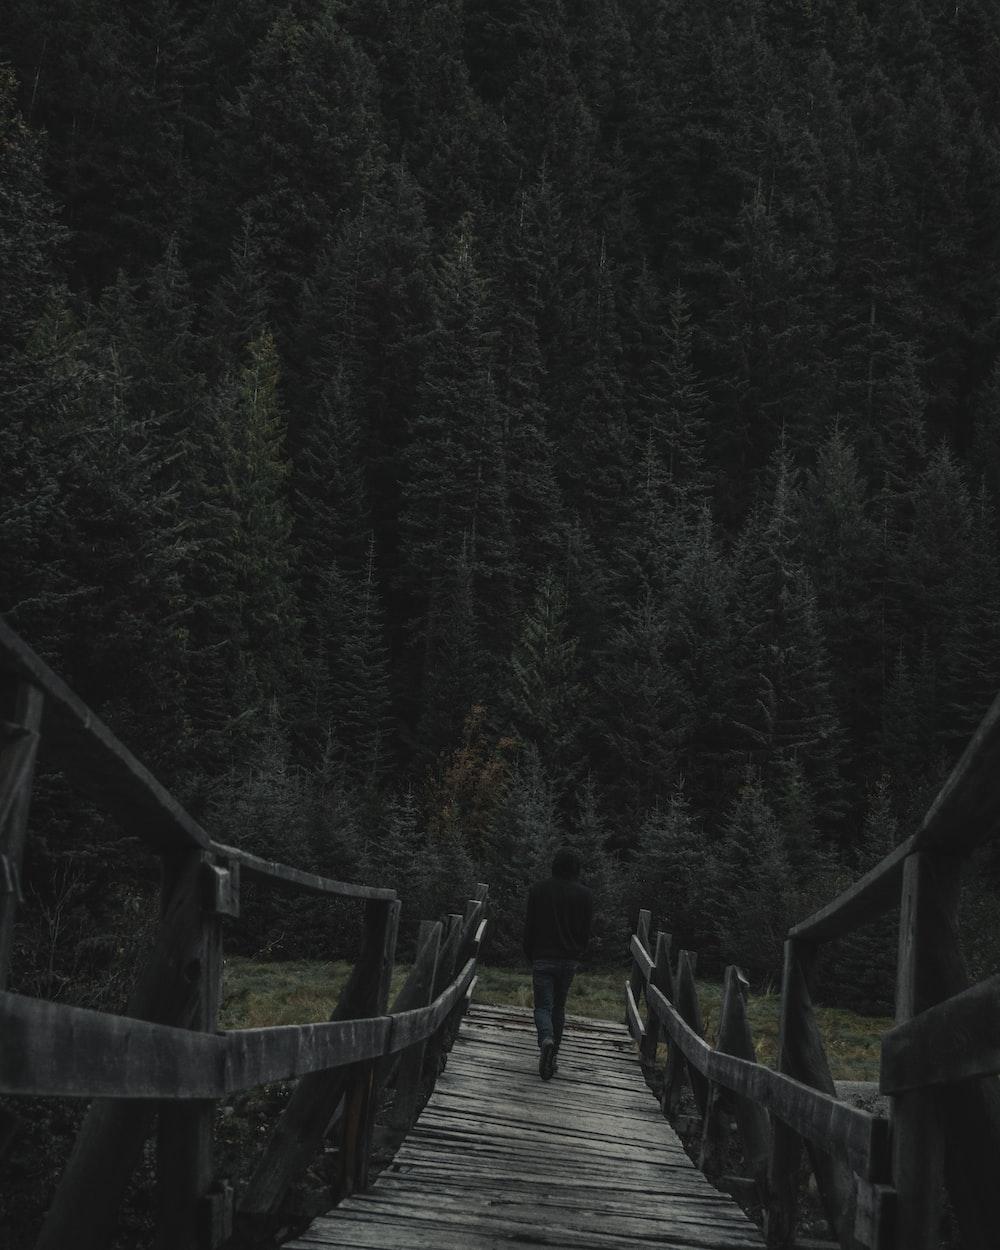 person walking on wooden bridge near pine trees during daytime